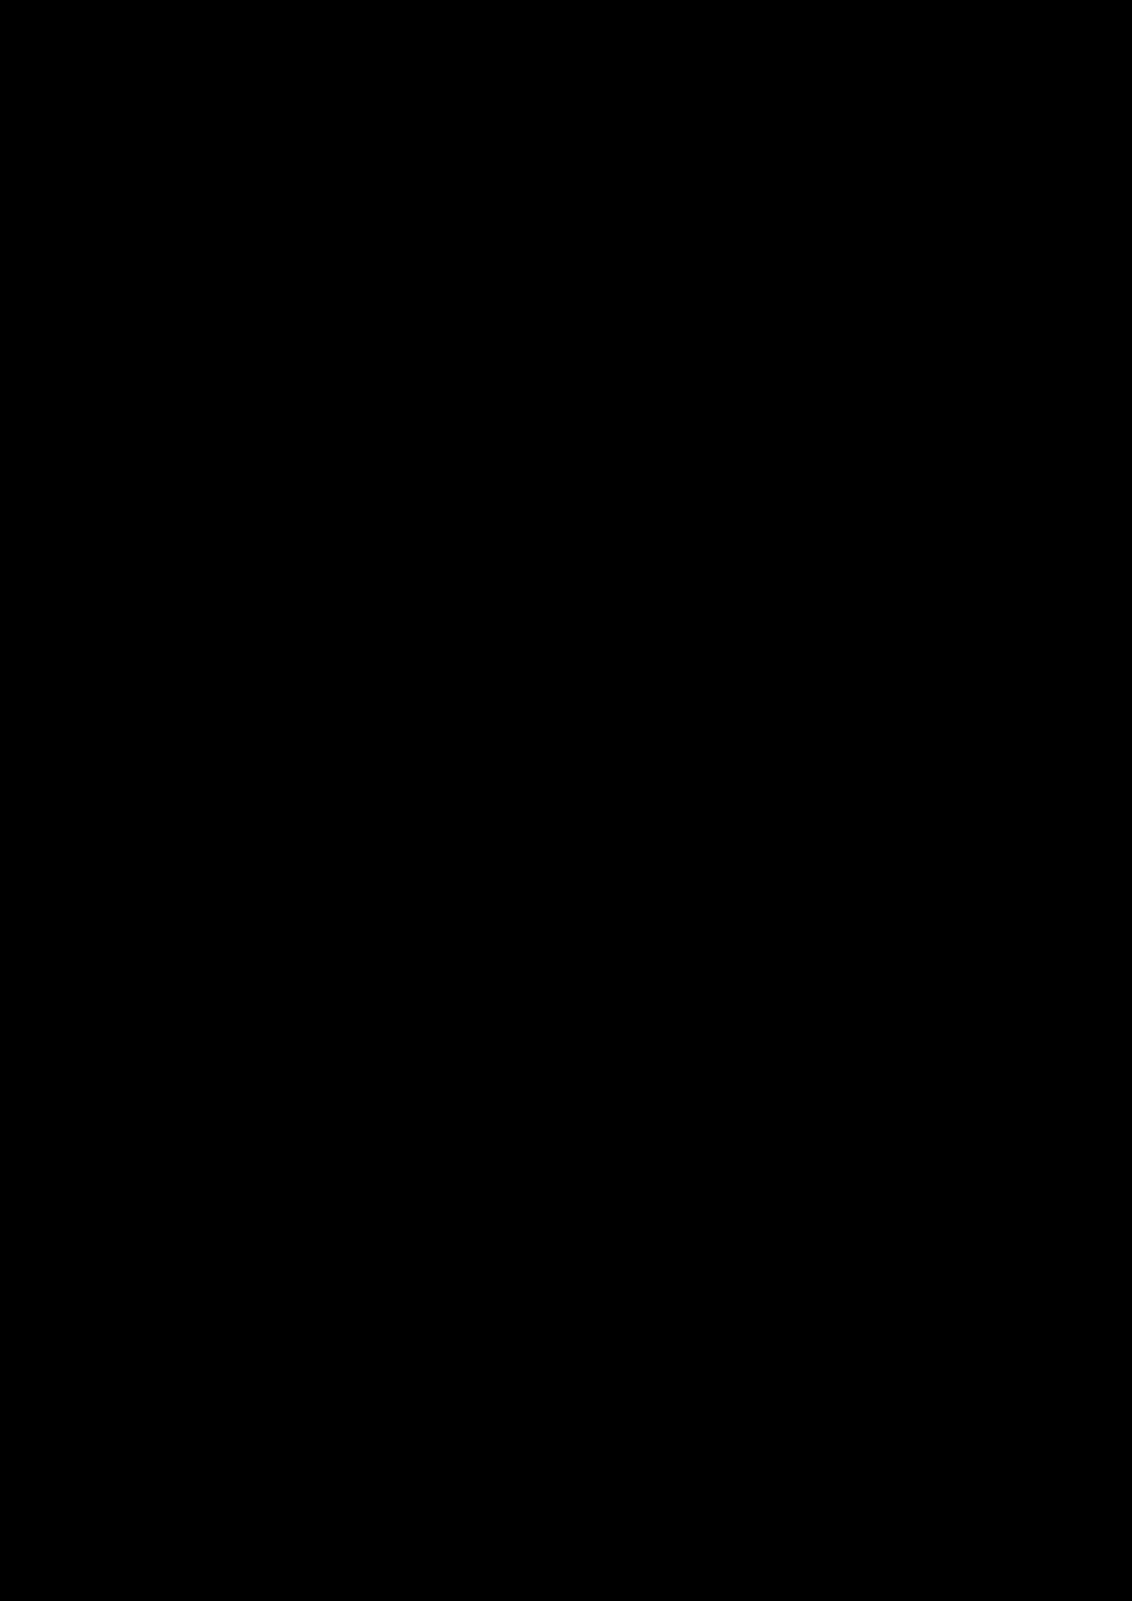 Ispoved Pervogo Boga slide, Image 7